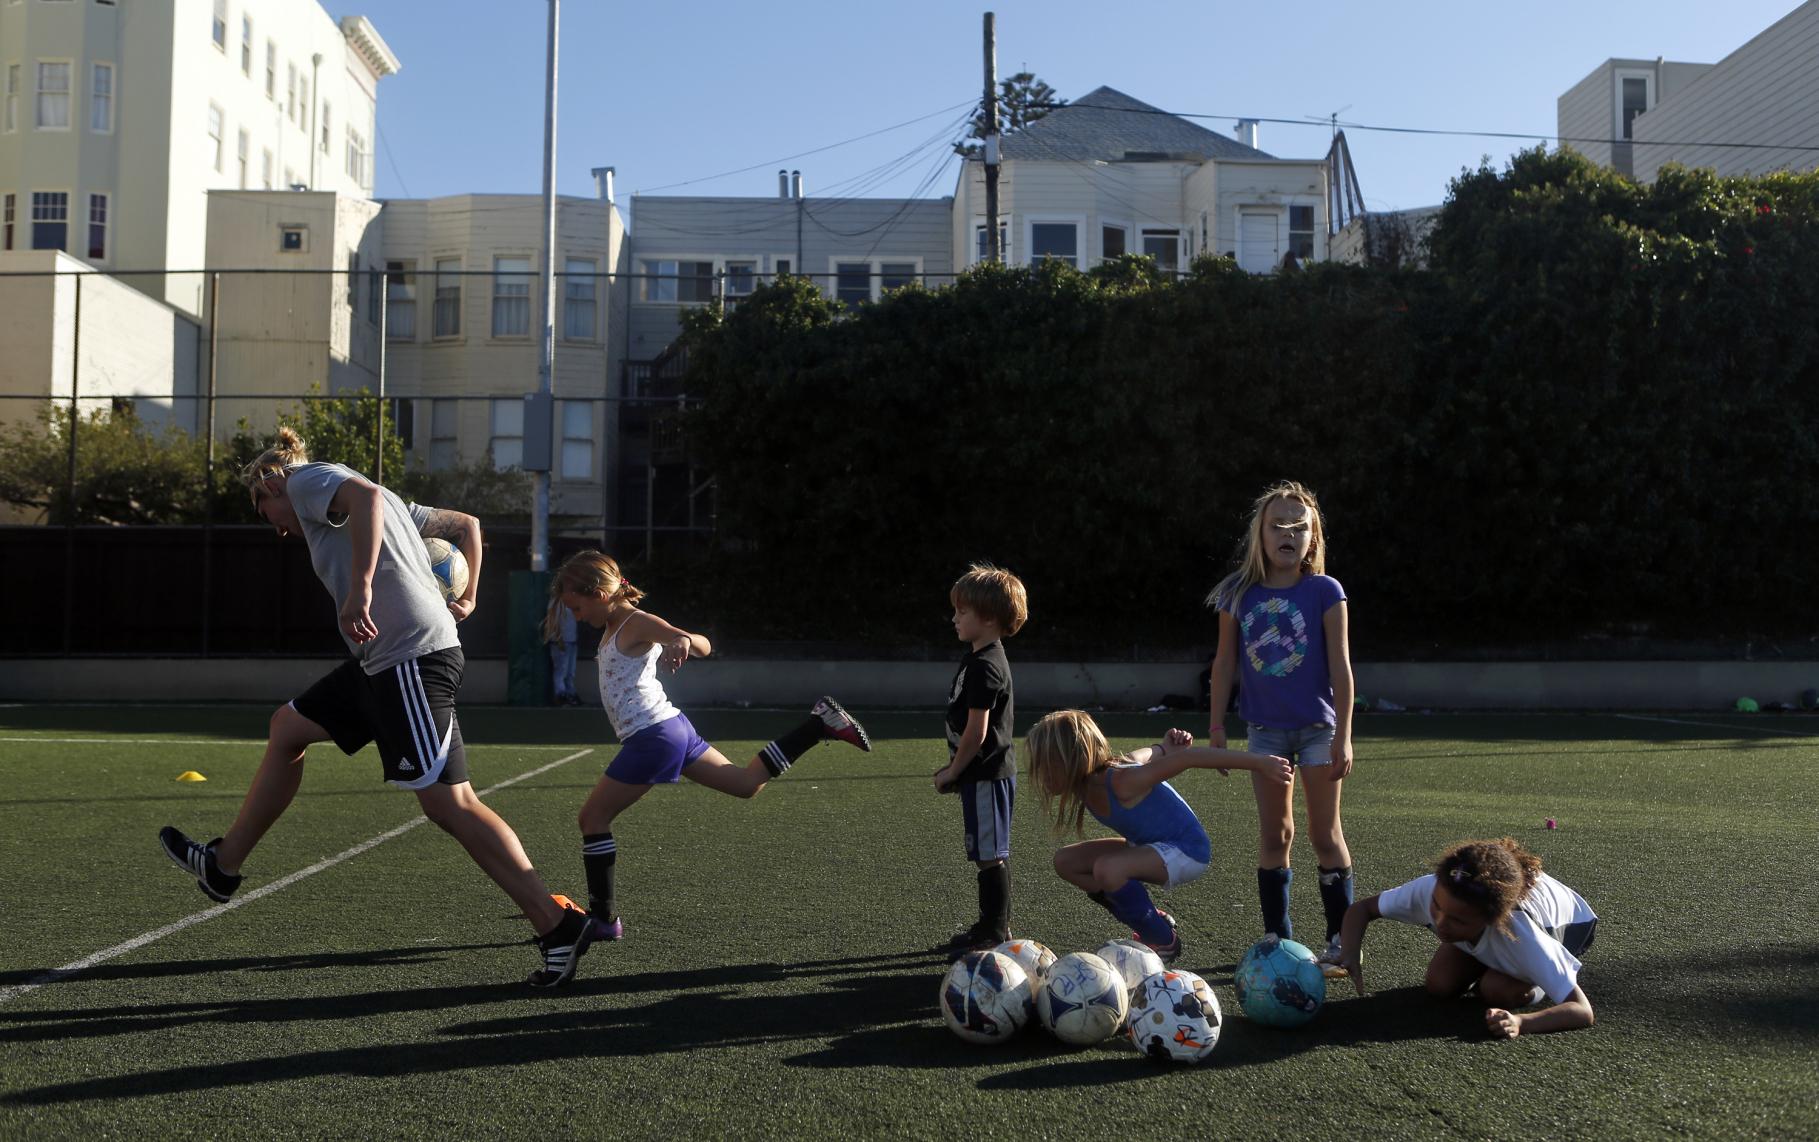 Techvskids playground video adds fuel to SFs field fight